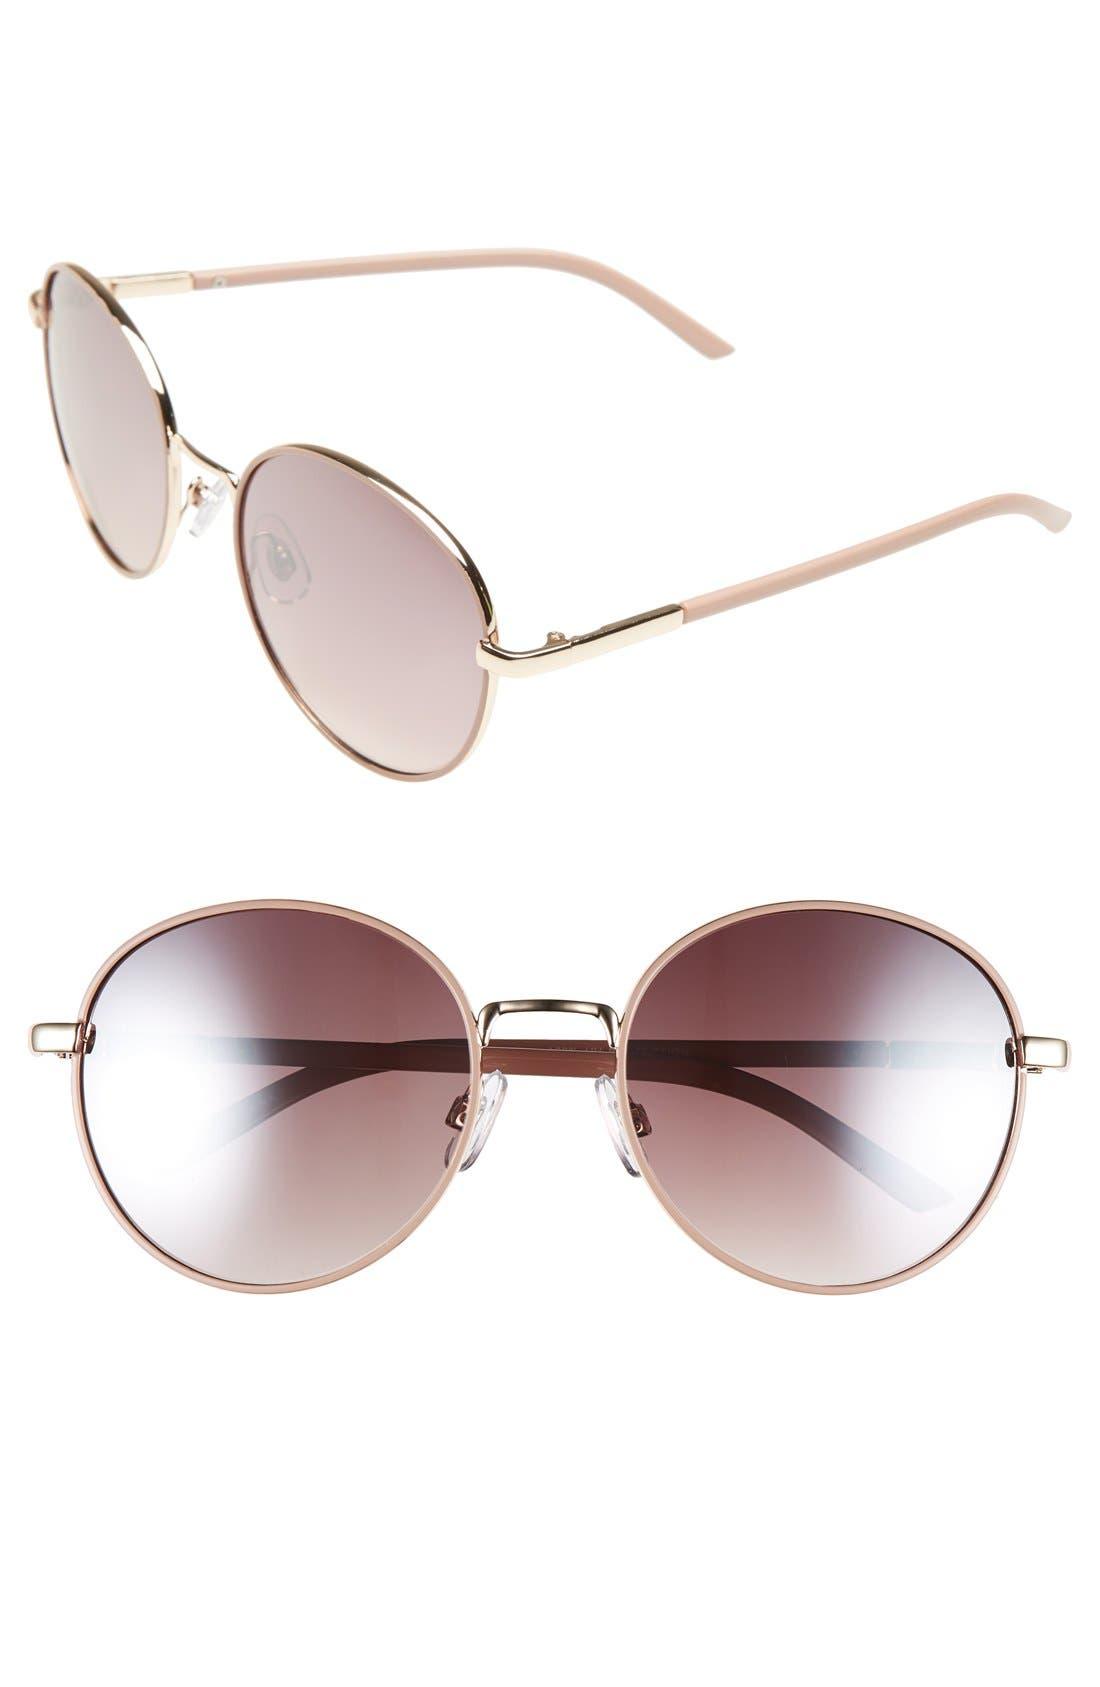 55mm Round Sunglasses,                             Main thumbnail 1, color,                             Mauve